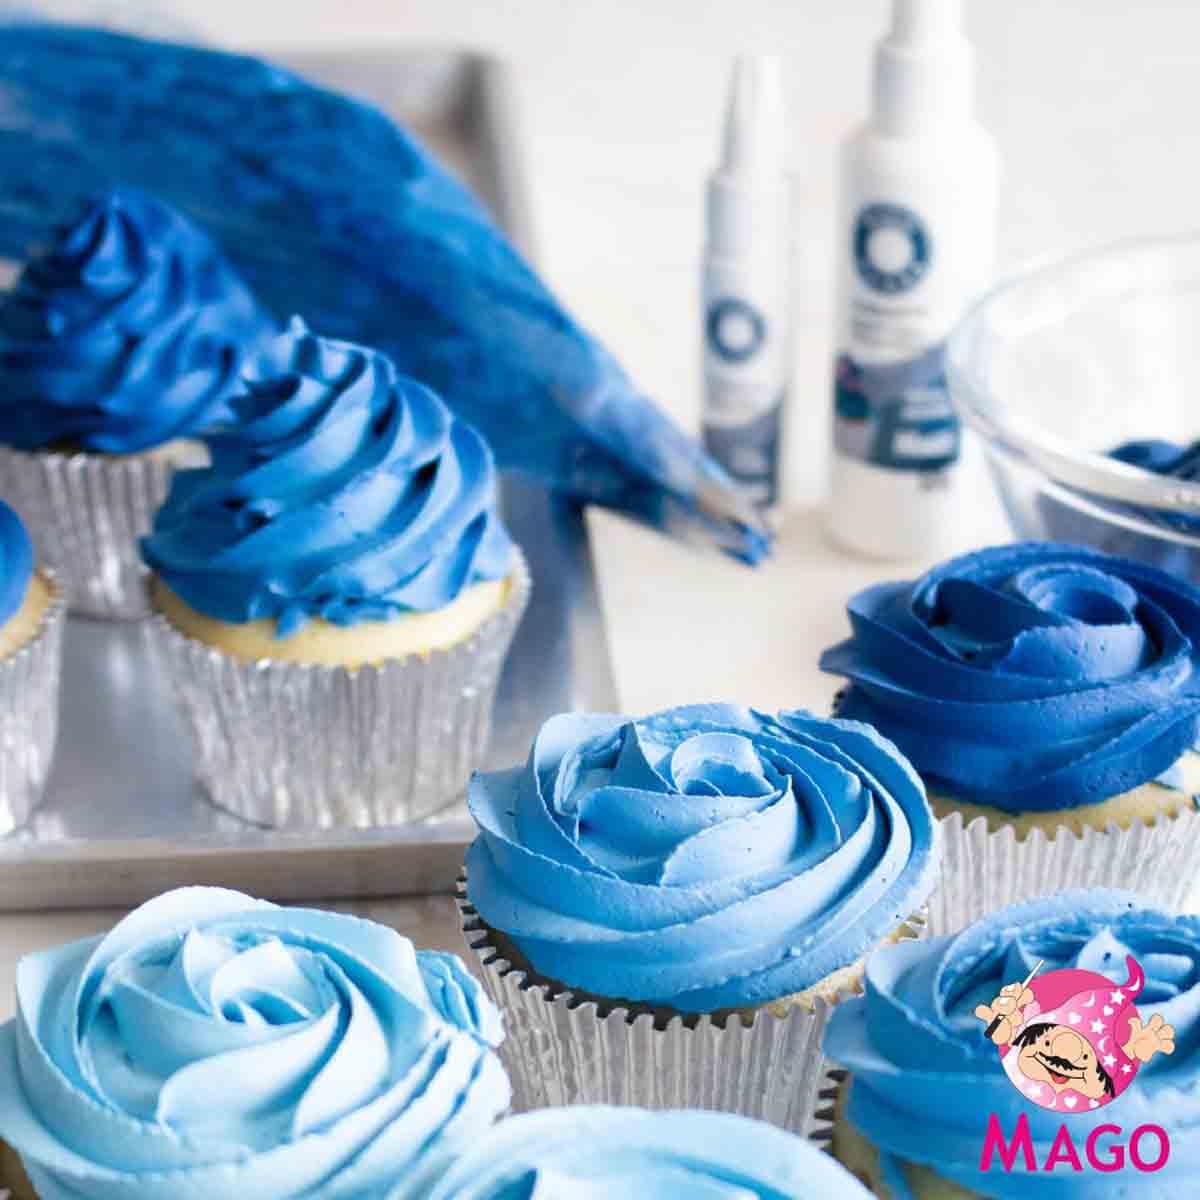 Corante Alimentício Soft Gel 60G Cor Azul Jeans MAGO